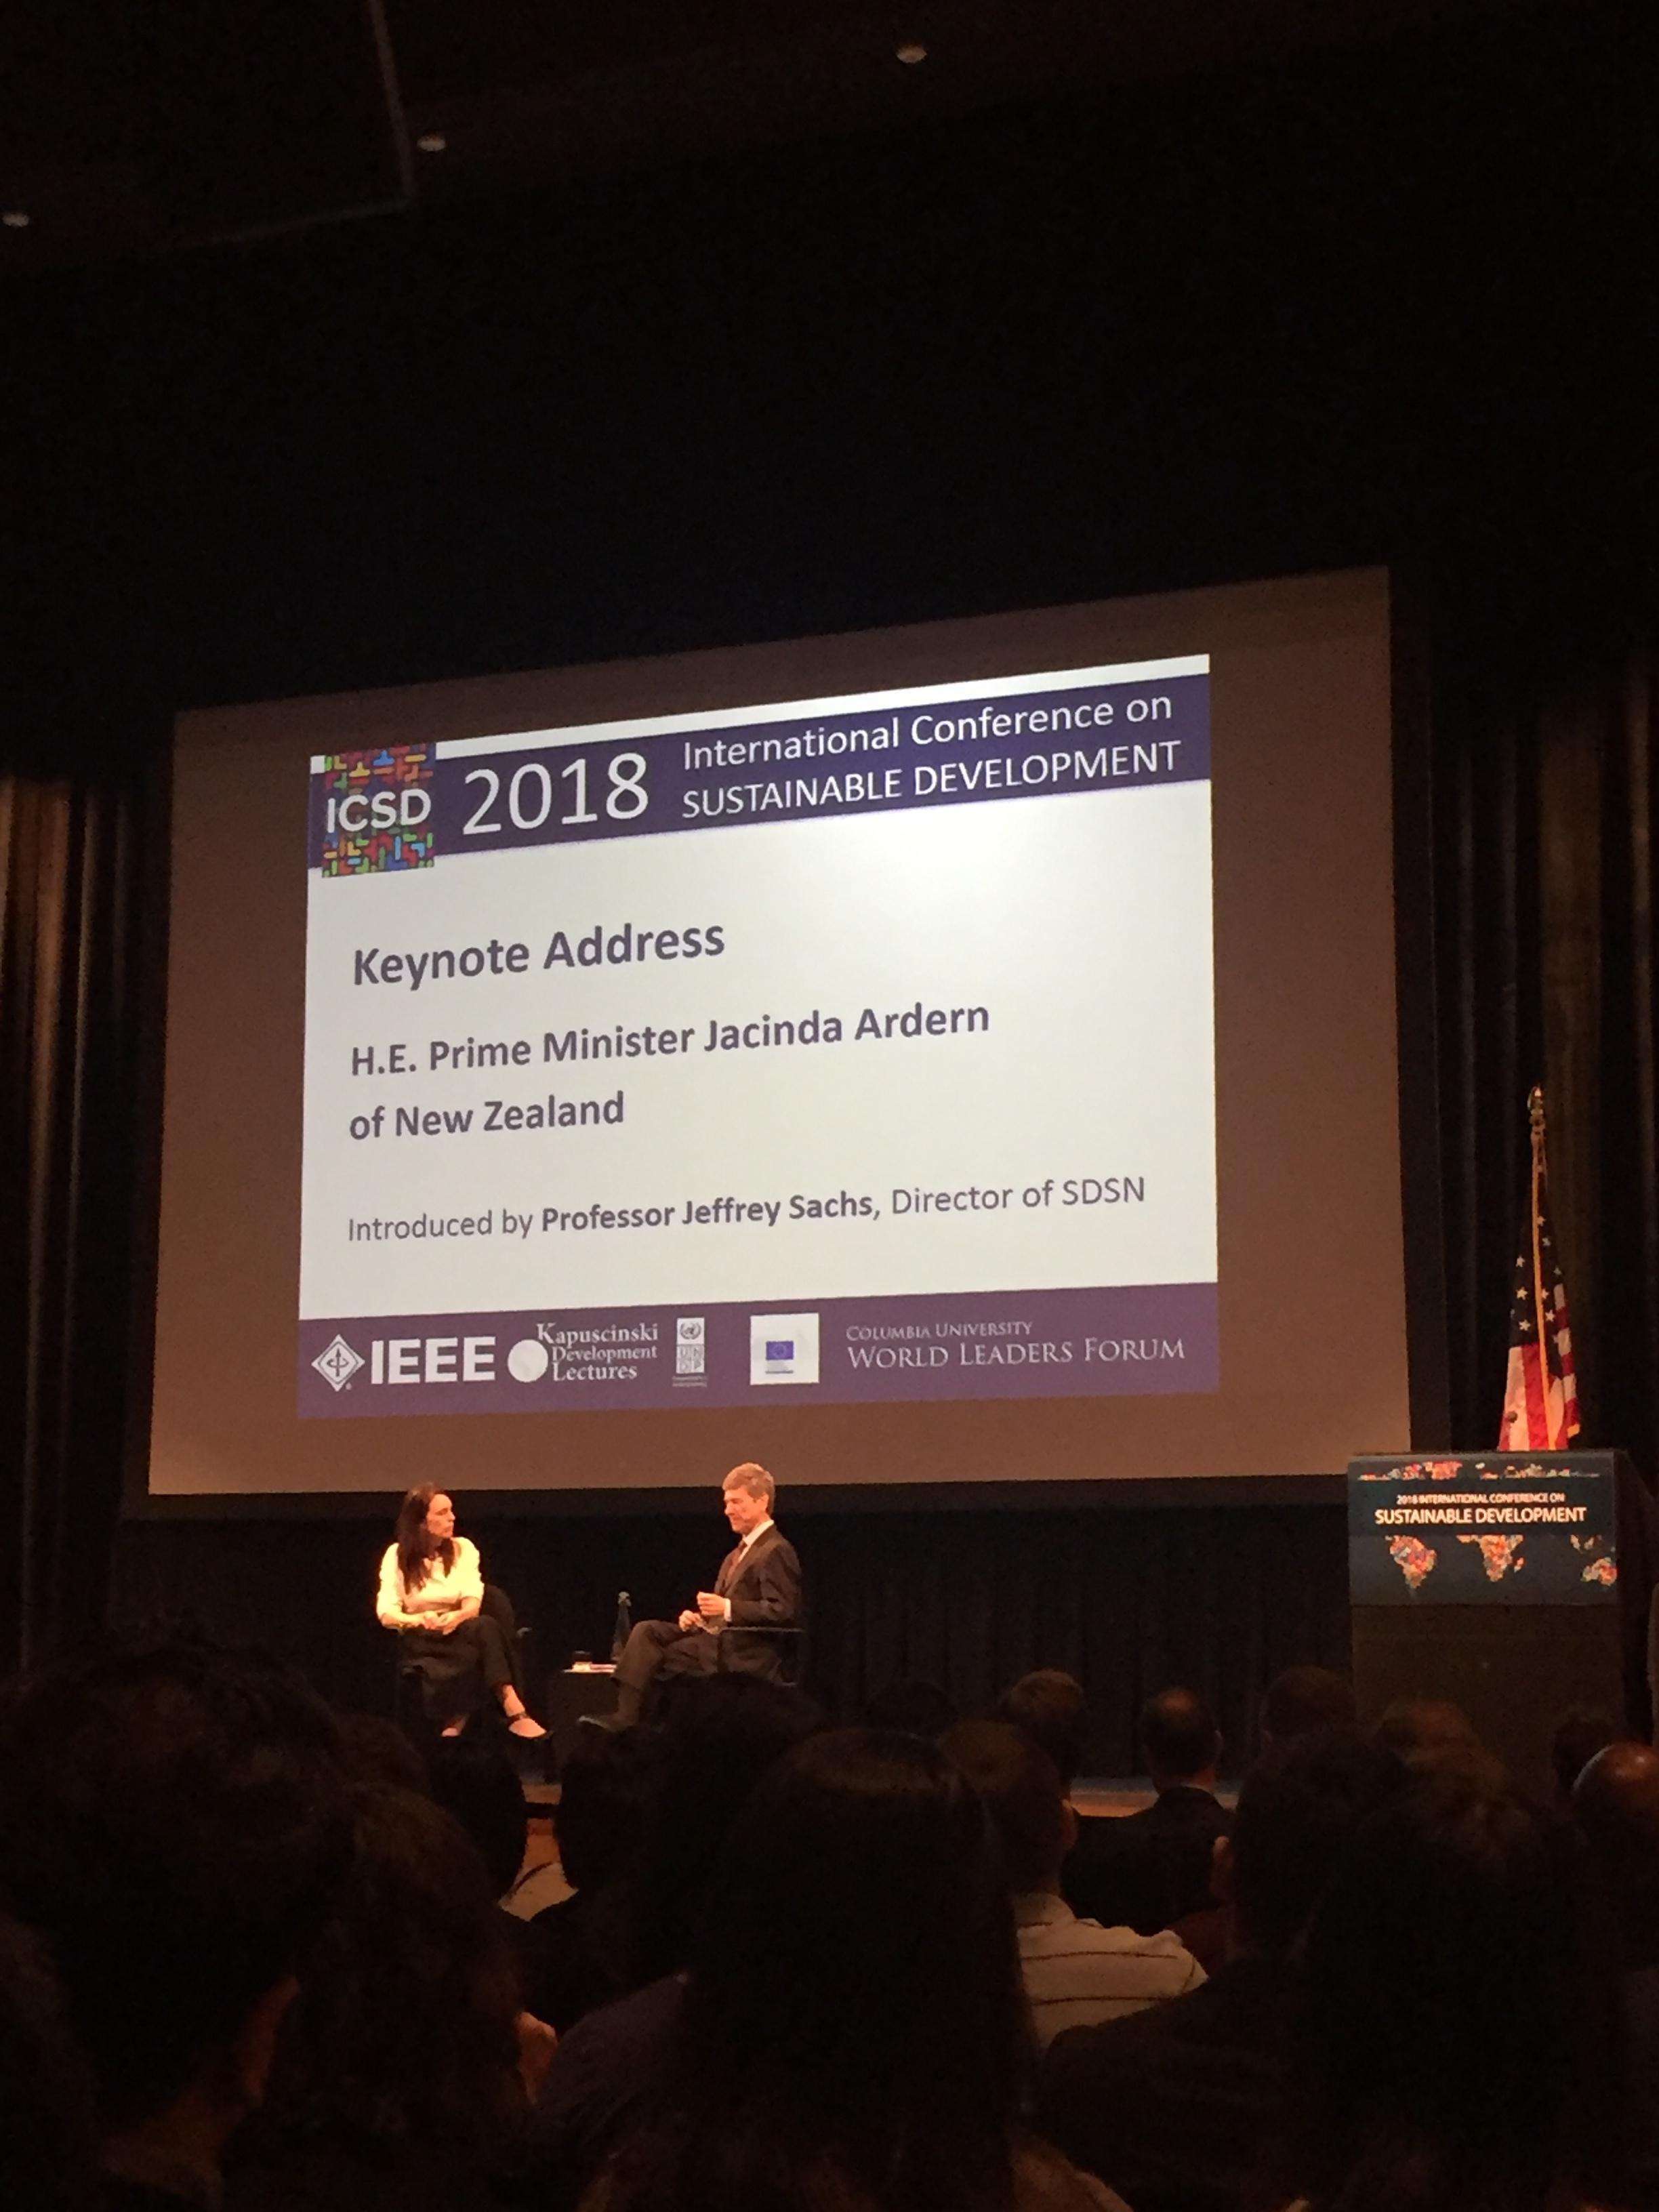 Professor Jeffrey Sachs interview PM Ardern after her keynote address at ICSD. Photo Credits: Sienna Nordquist